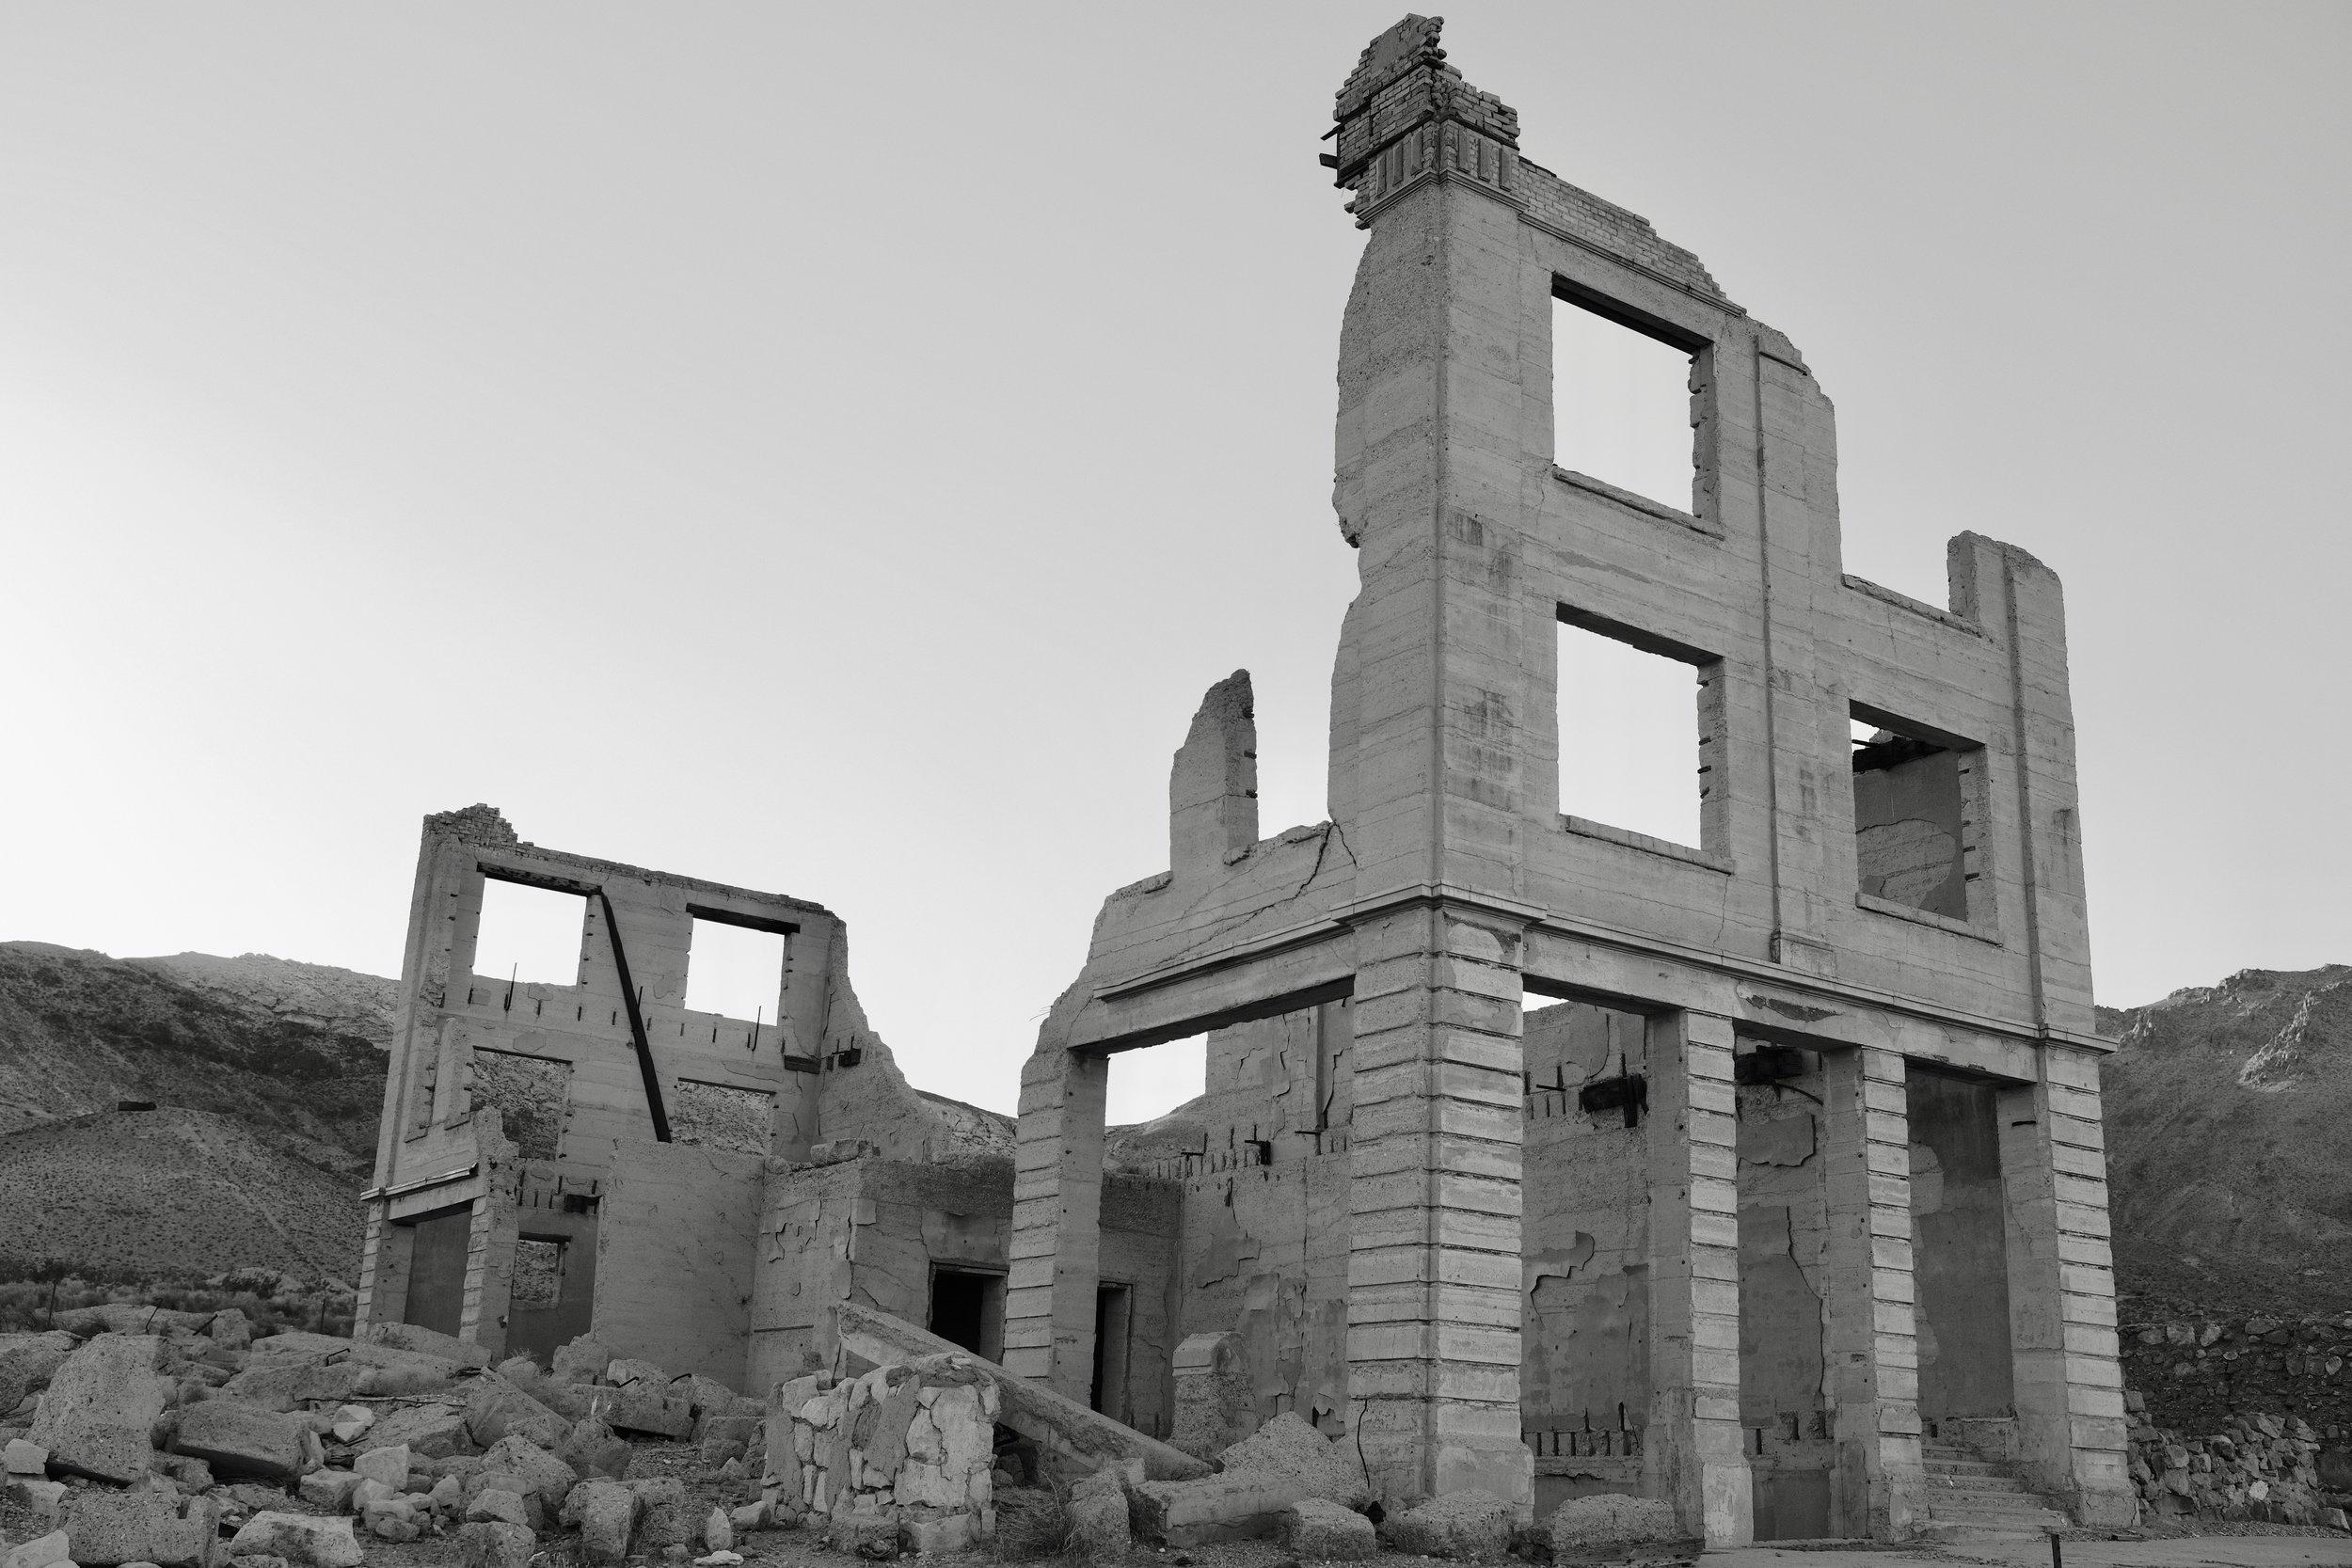 The Rhyolite Bank